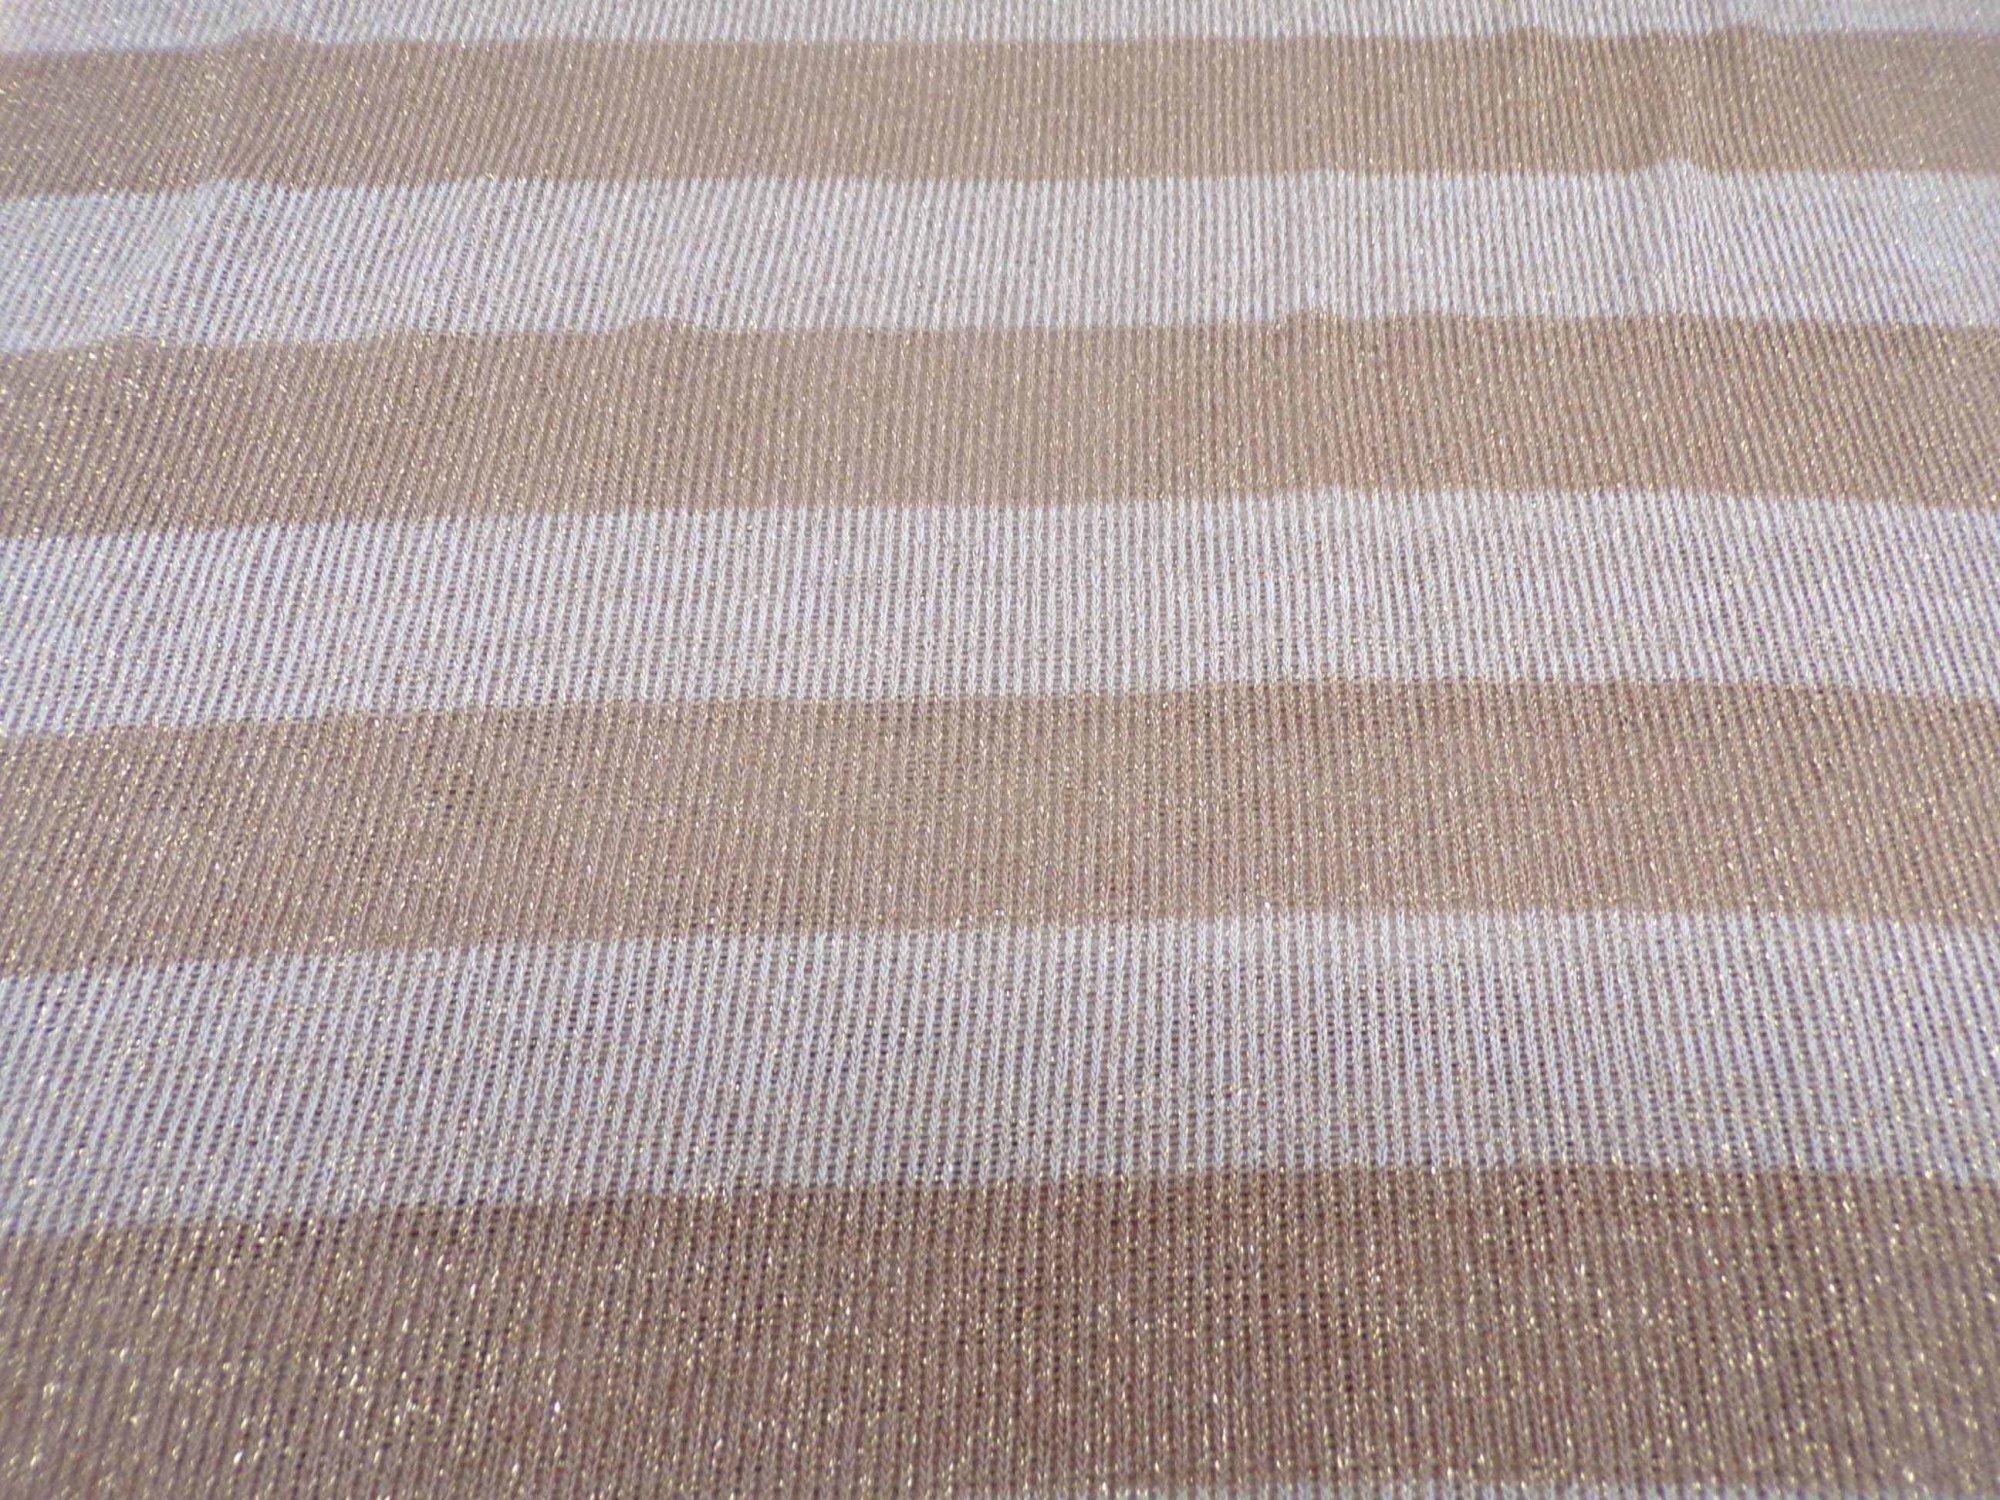 Tan & Cream Wide Striped Sweater Knit